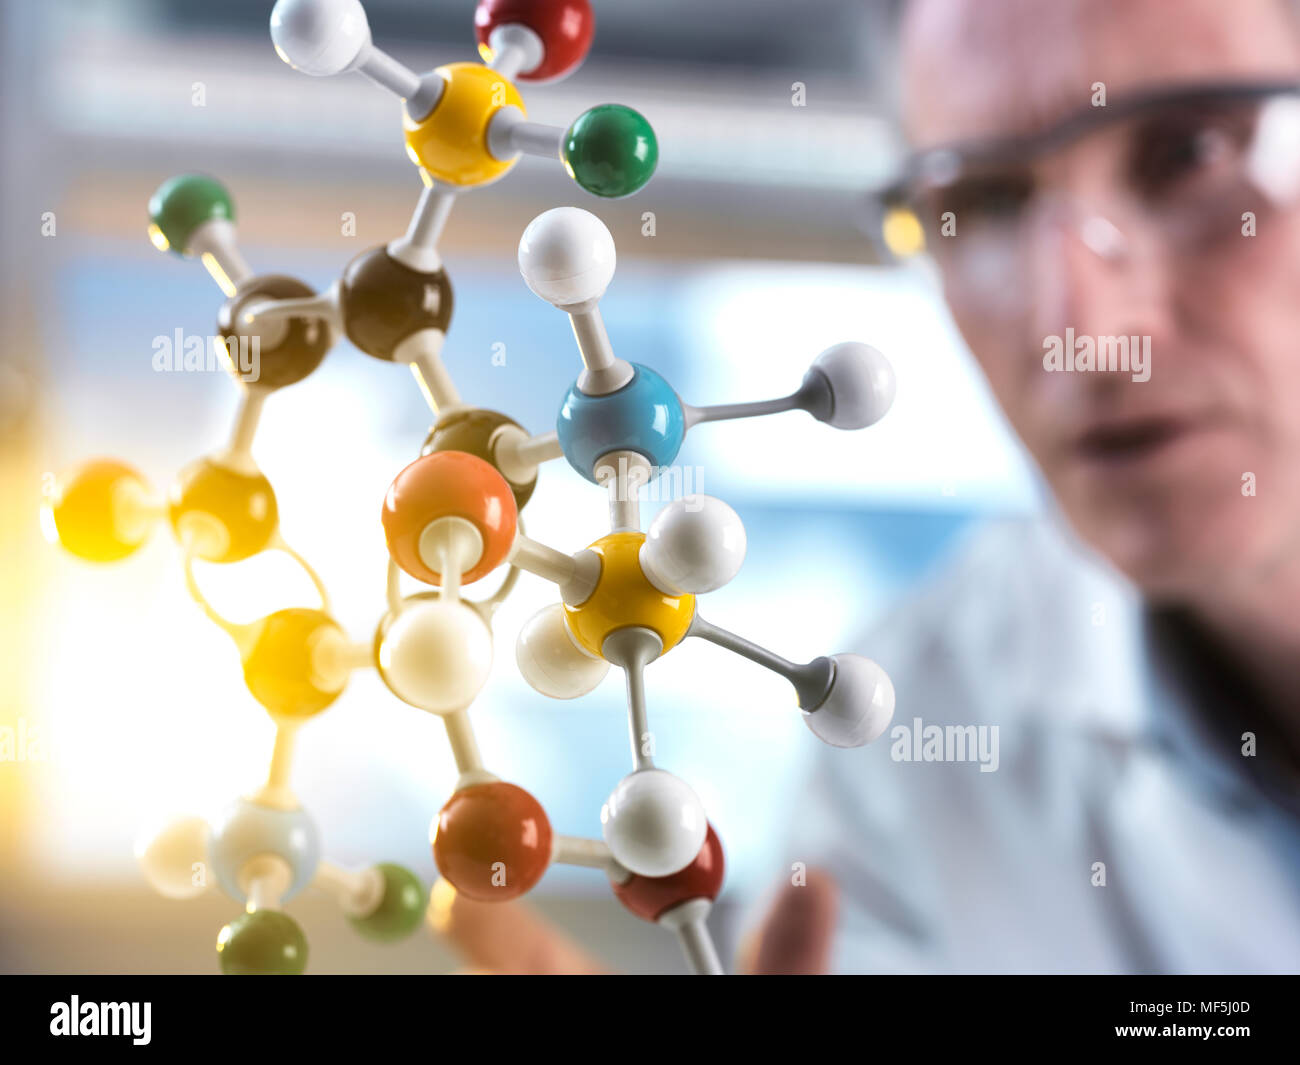 Scientist looking at molecular model - Stock Image